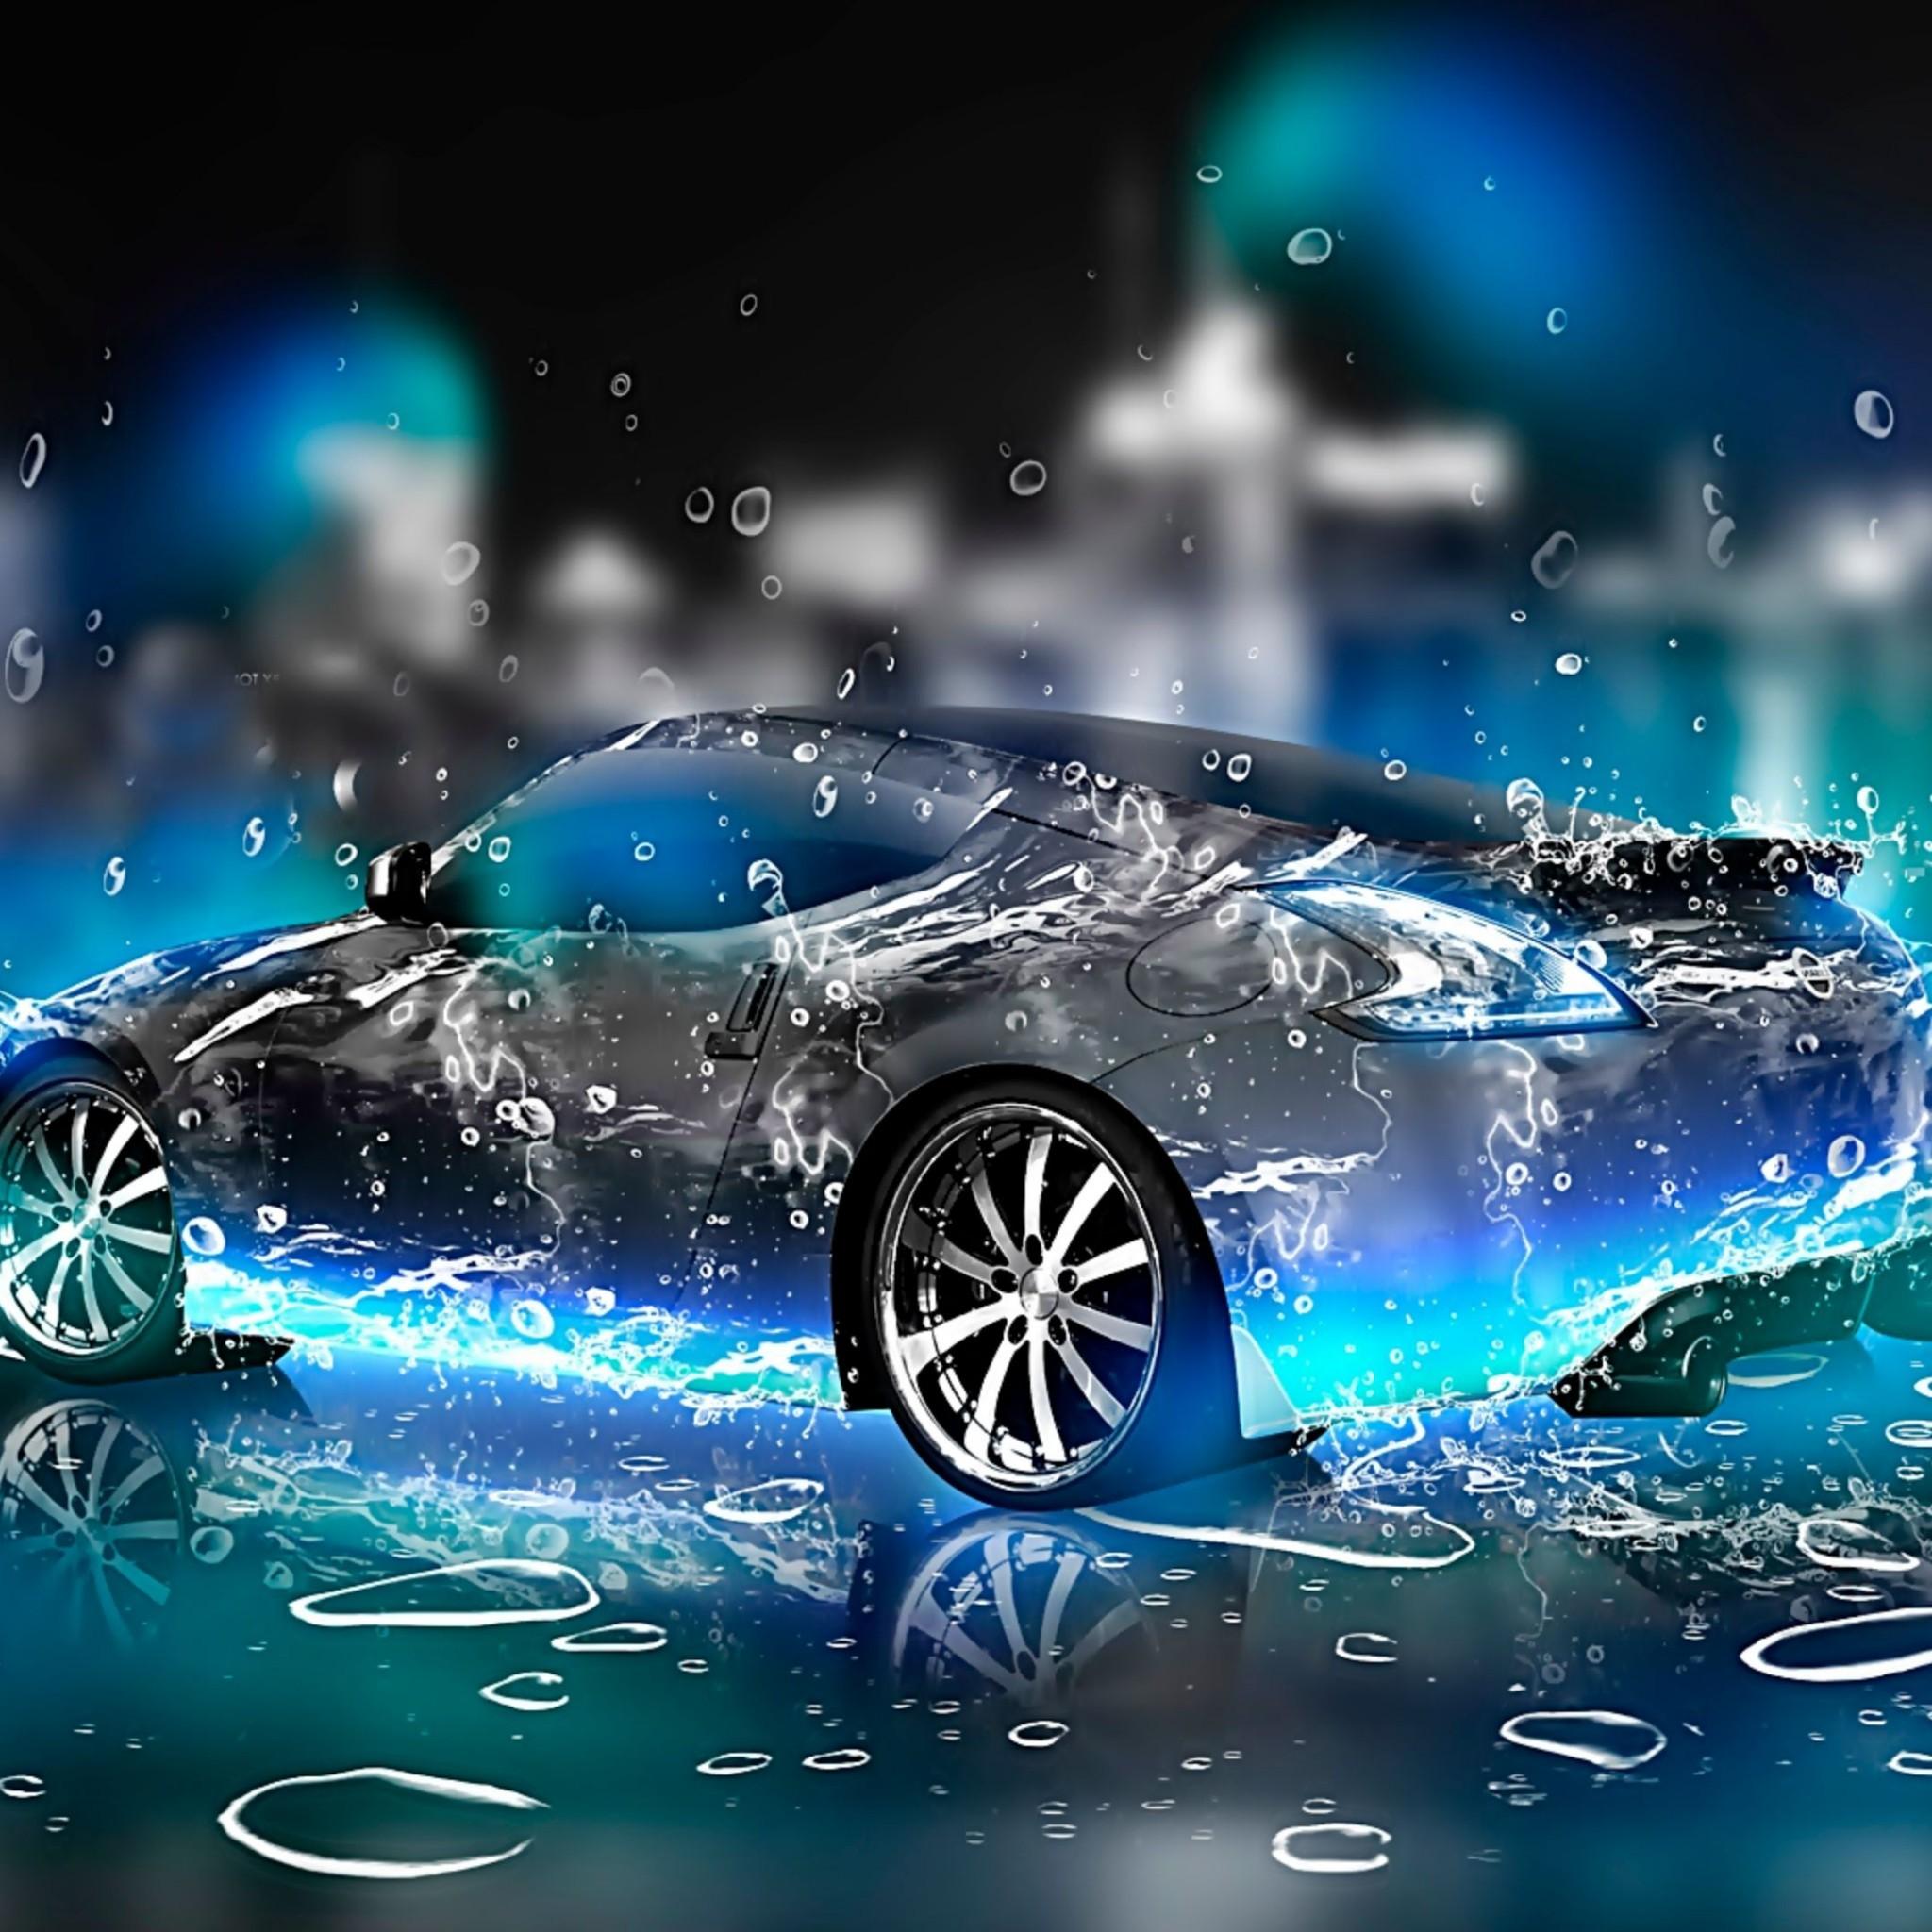 3d Cars Hd Wallpapers: 3D Name Wallpaper ·① WallpaperTag